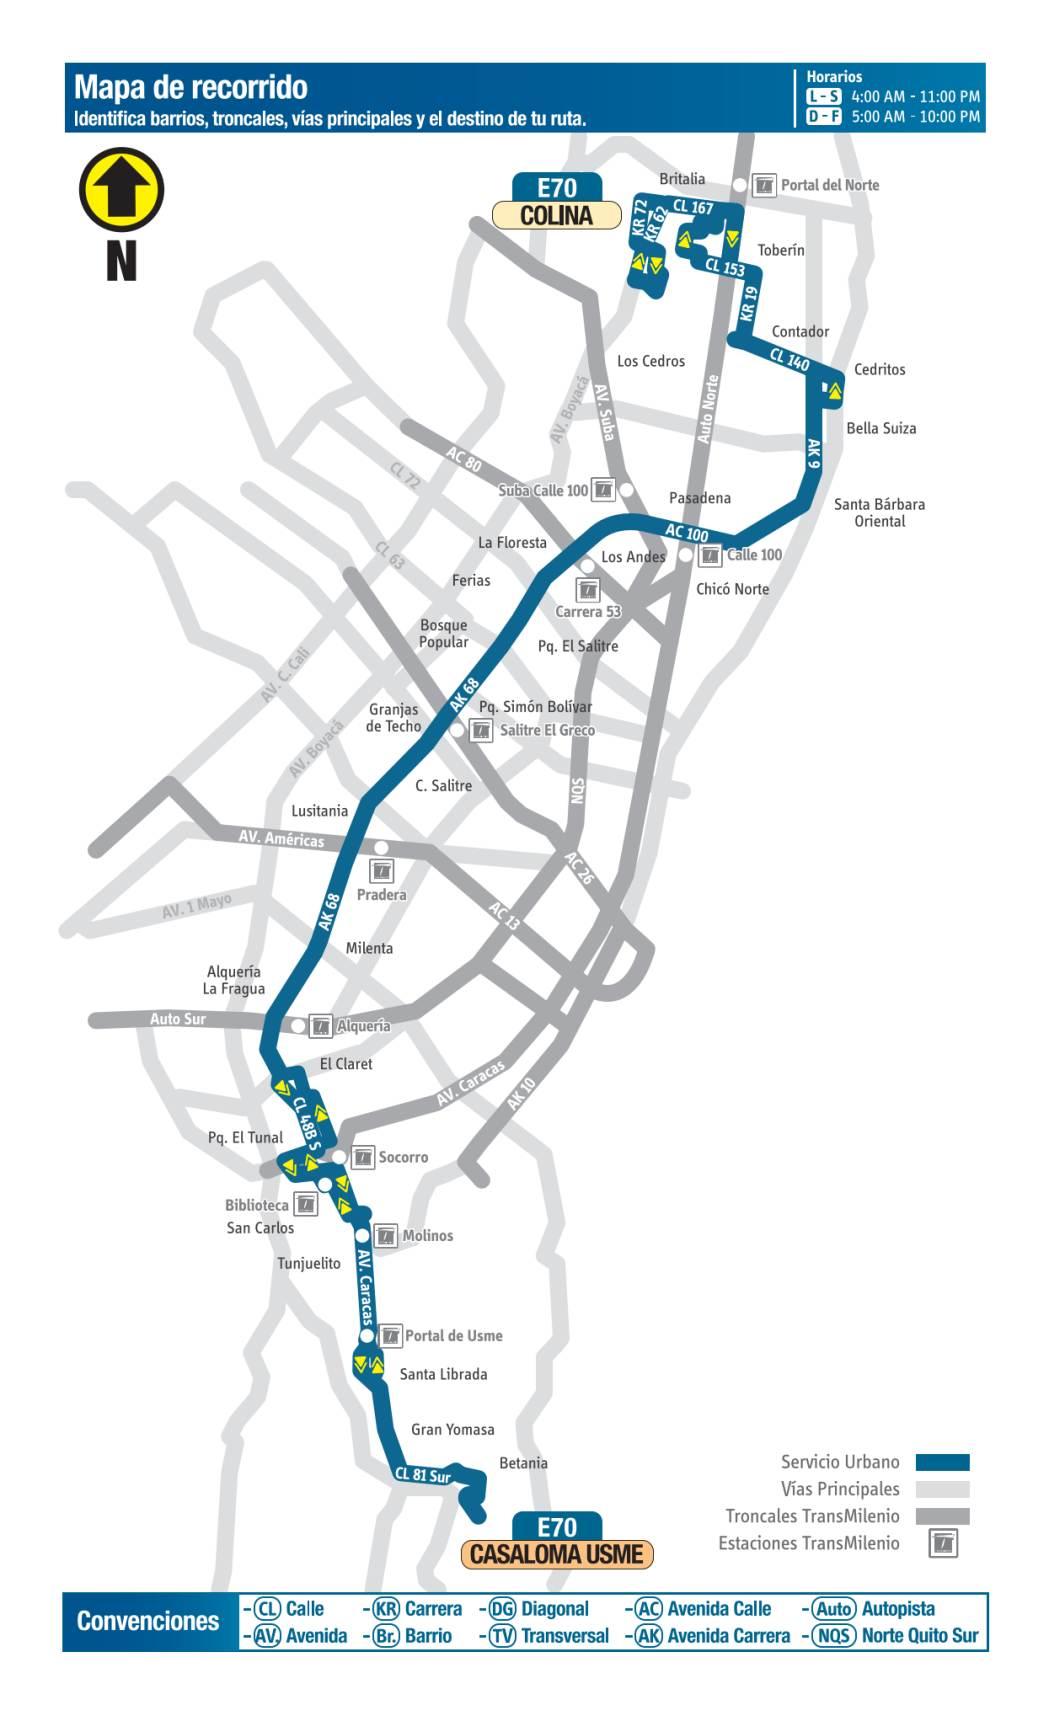 E70 Casaloma Usme - Colina, mapa bus urbano Bogotá